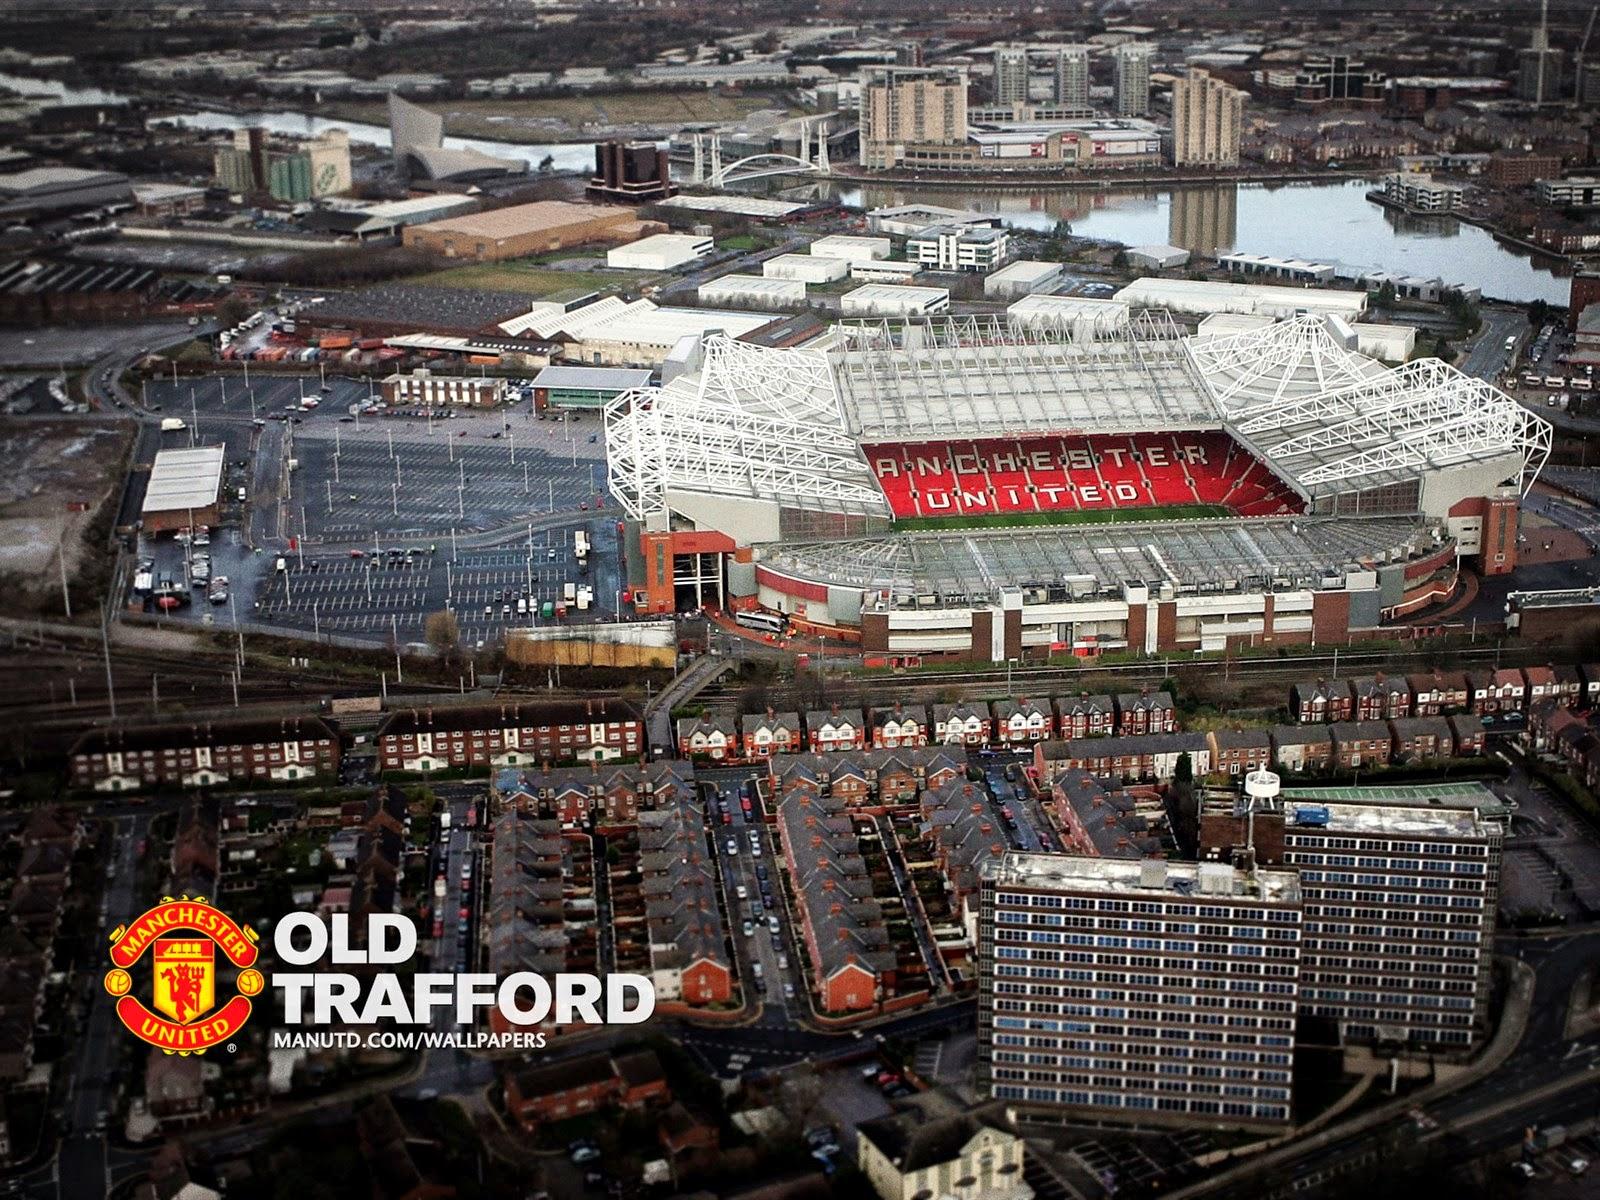 Old Trafford - Manchester United F.C. Stadium